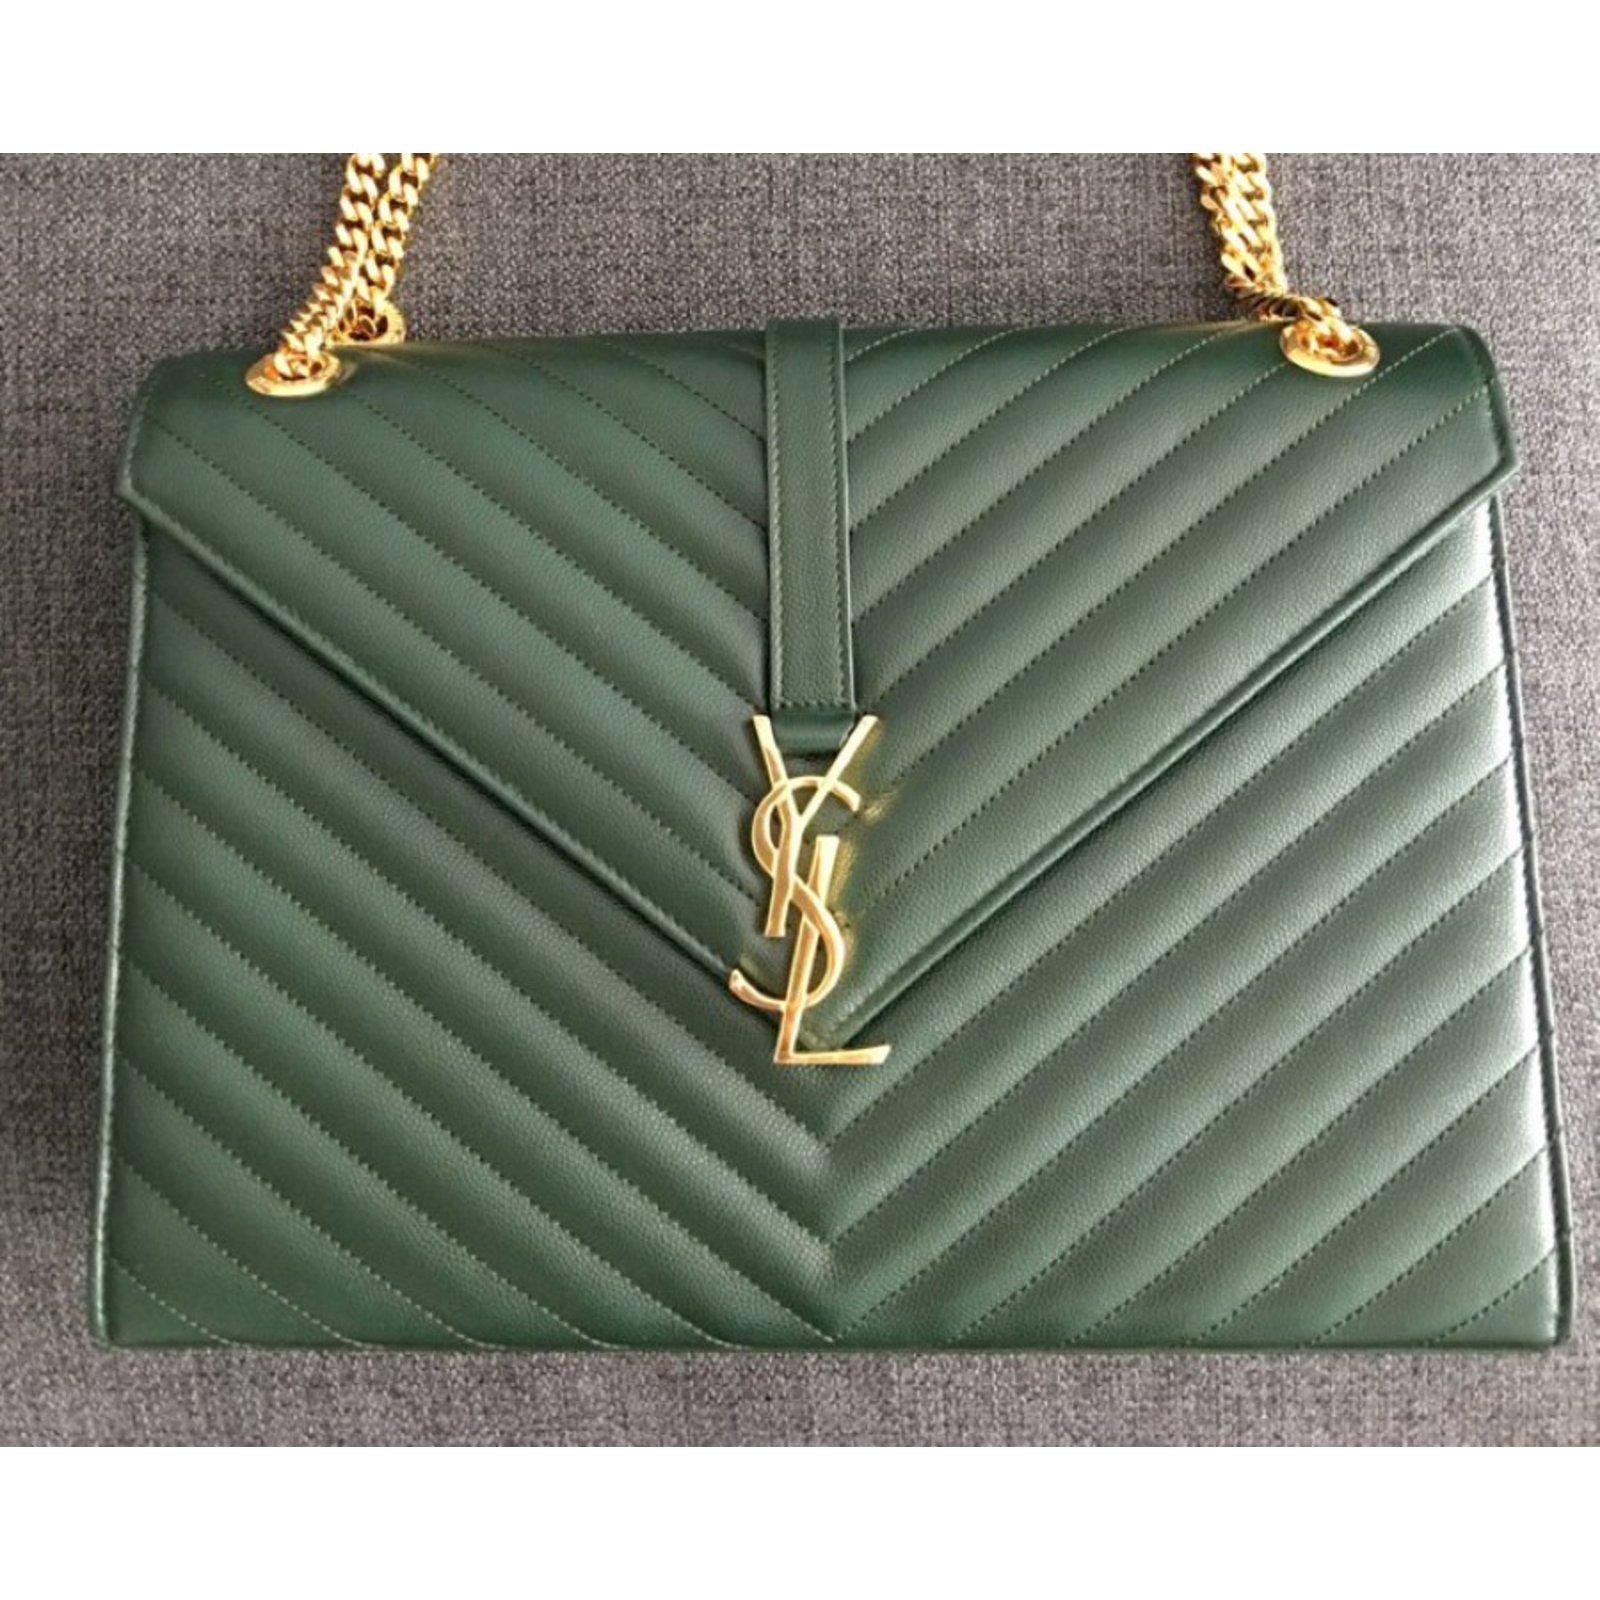 cde6ac5345 Saint Laurent Bag Handbags Leather Green ref.72018 - Joli Closet